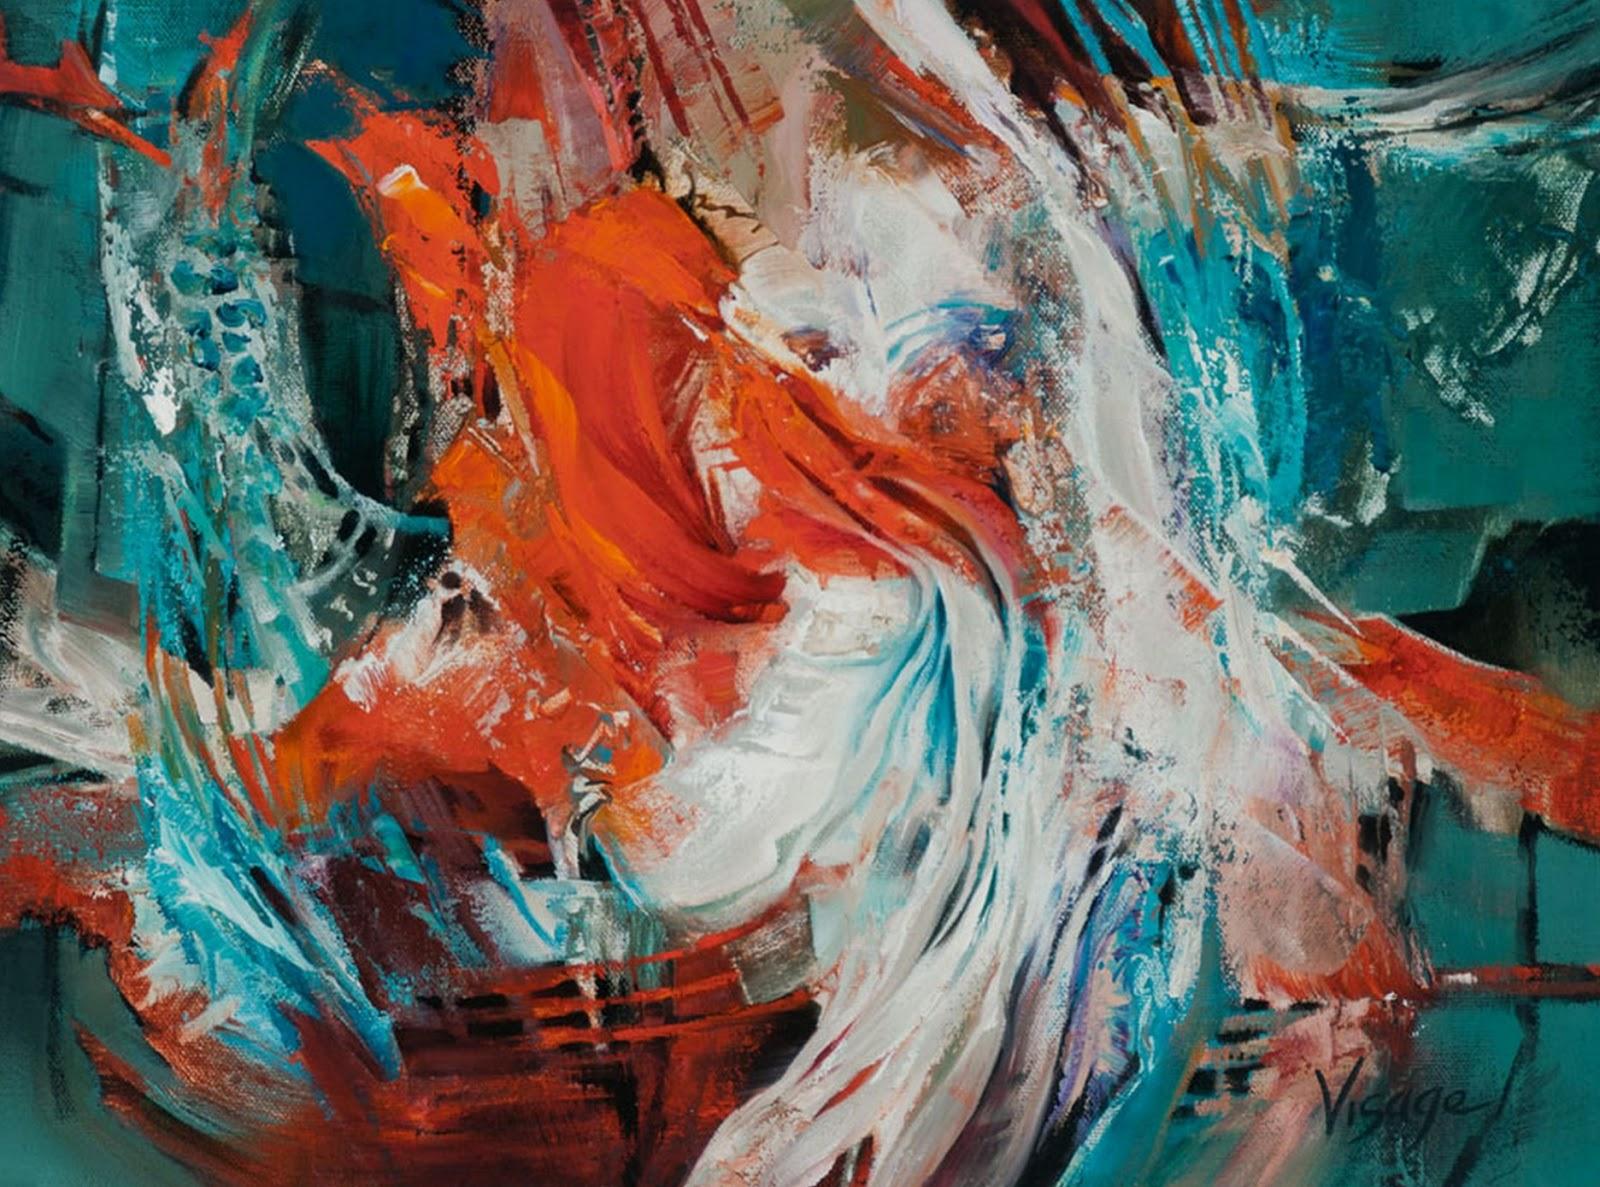 Pintura moderna y fotograf a art stica cuadros for Cuadros coloridos modernos